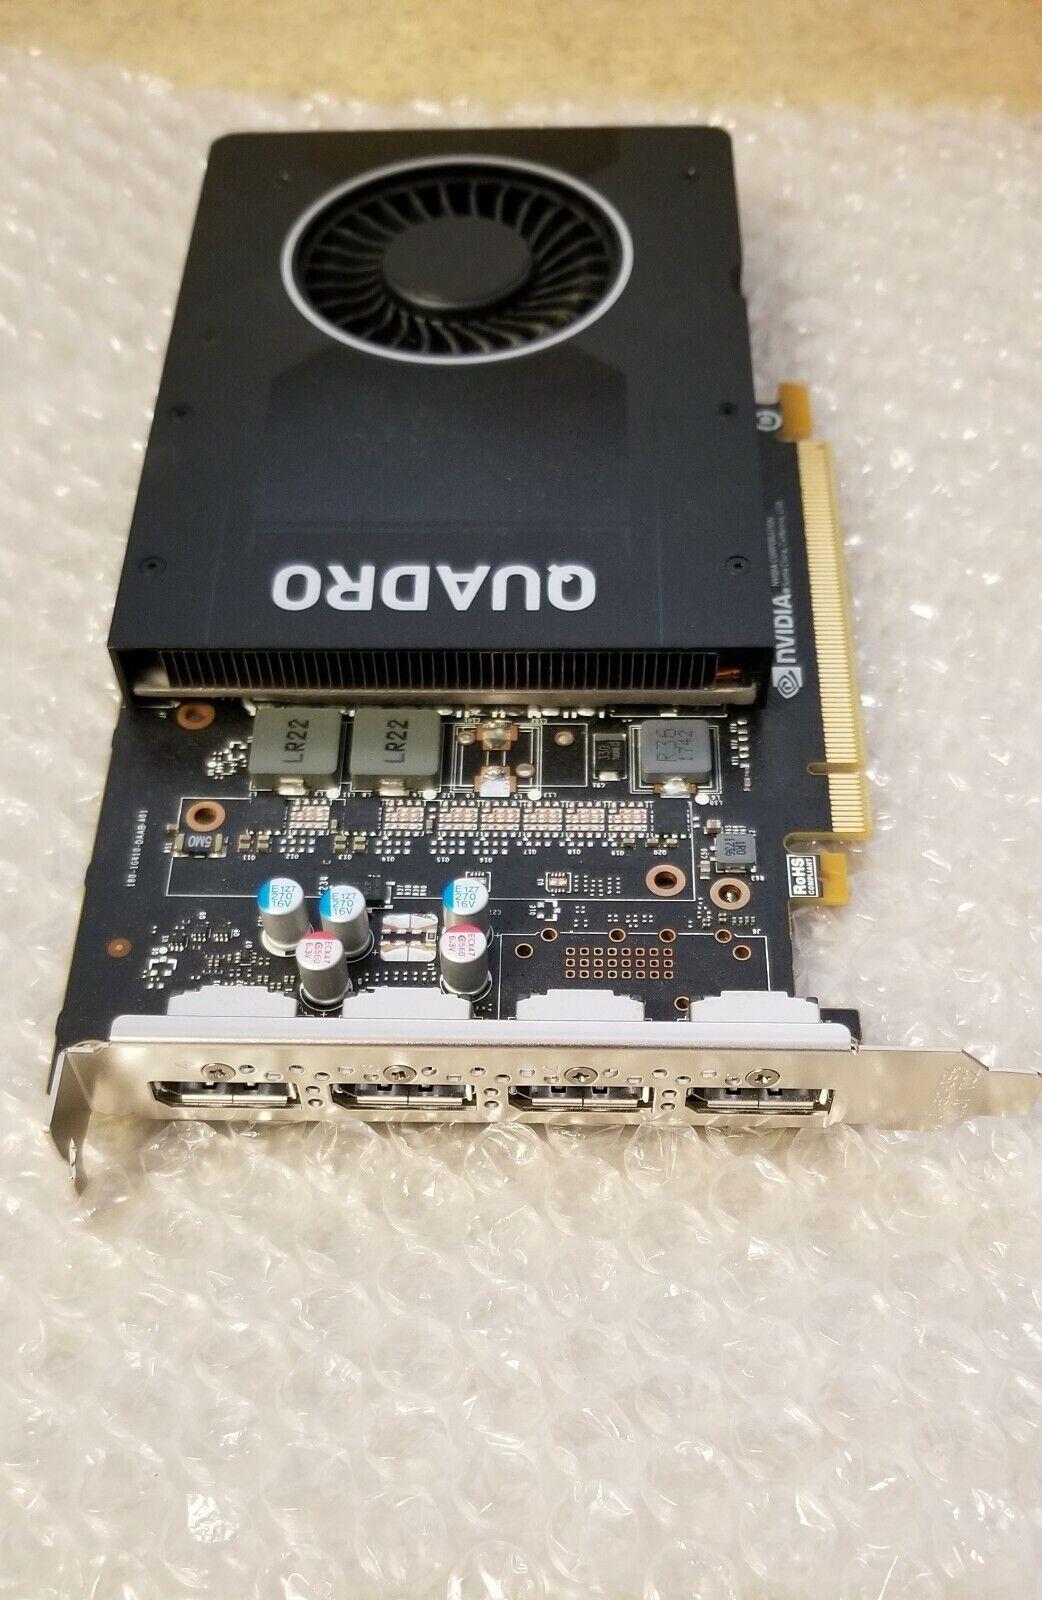 PNY Nvidia Quadro P2000 5GB GDDR5 Video Graphics Card TESTED